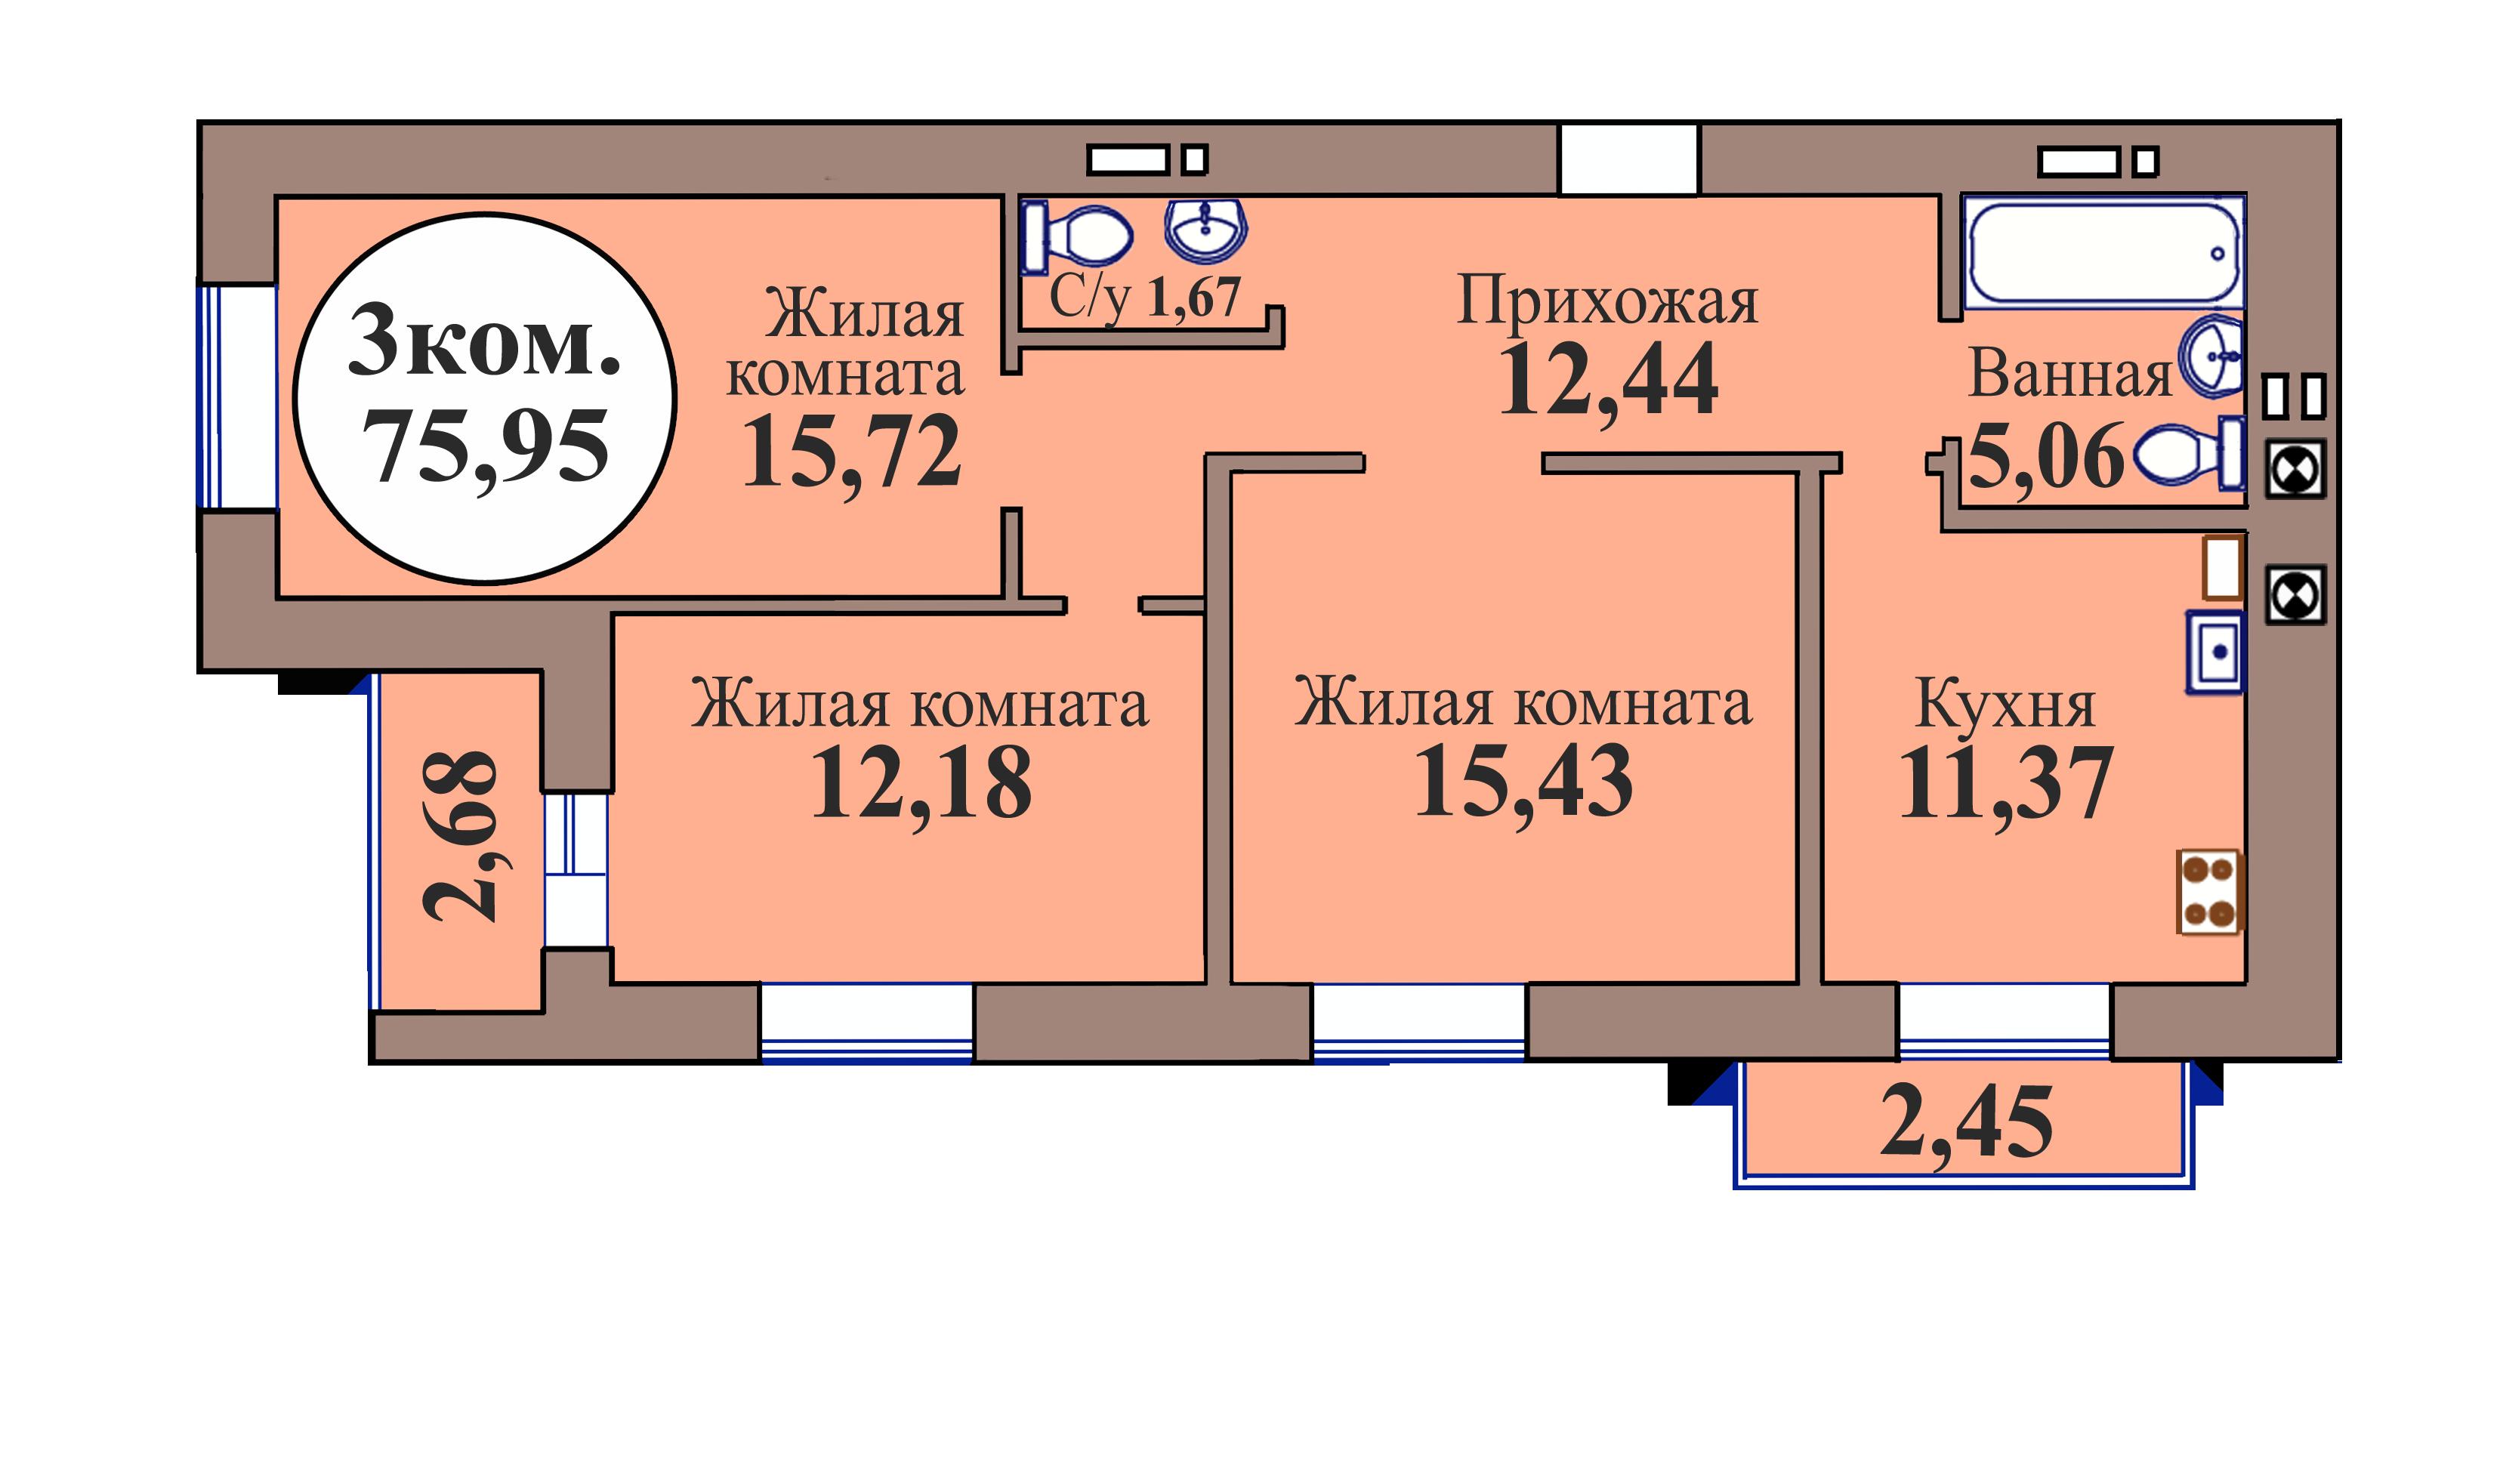 3-комн. кв. по пер. Калининградский, 5 кв. 224 в Калининграде